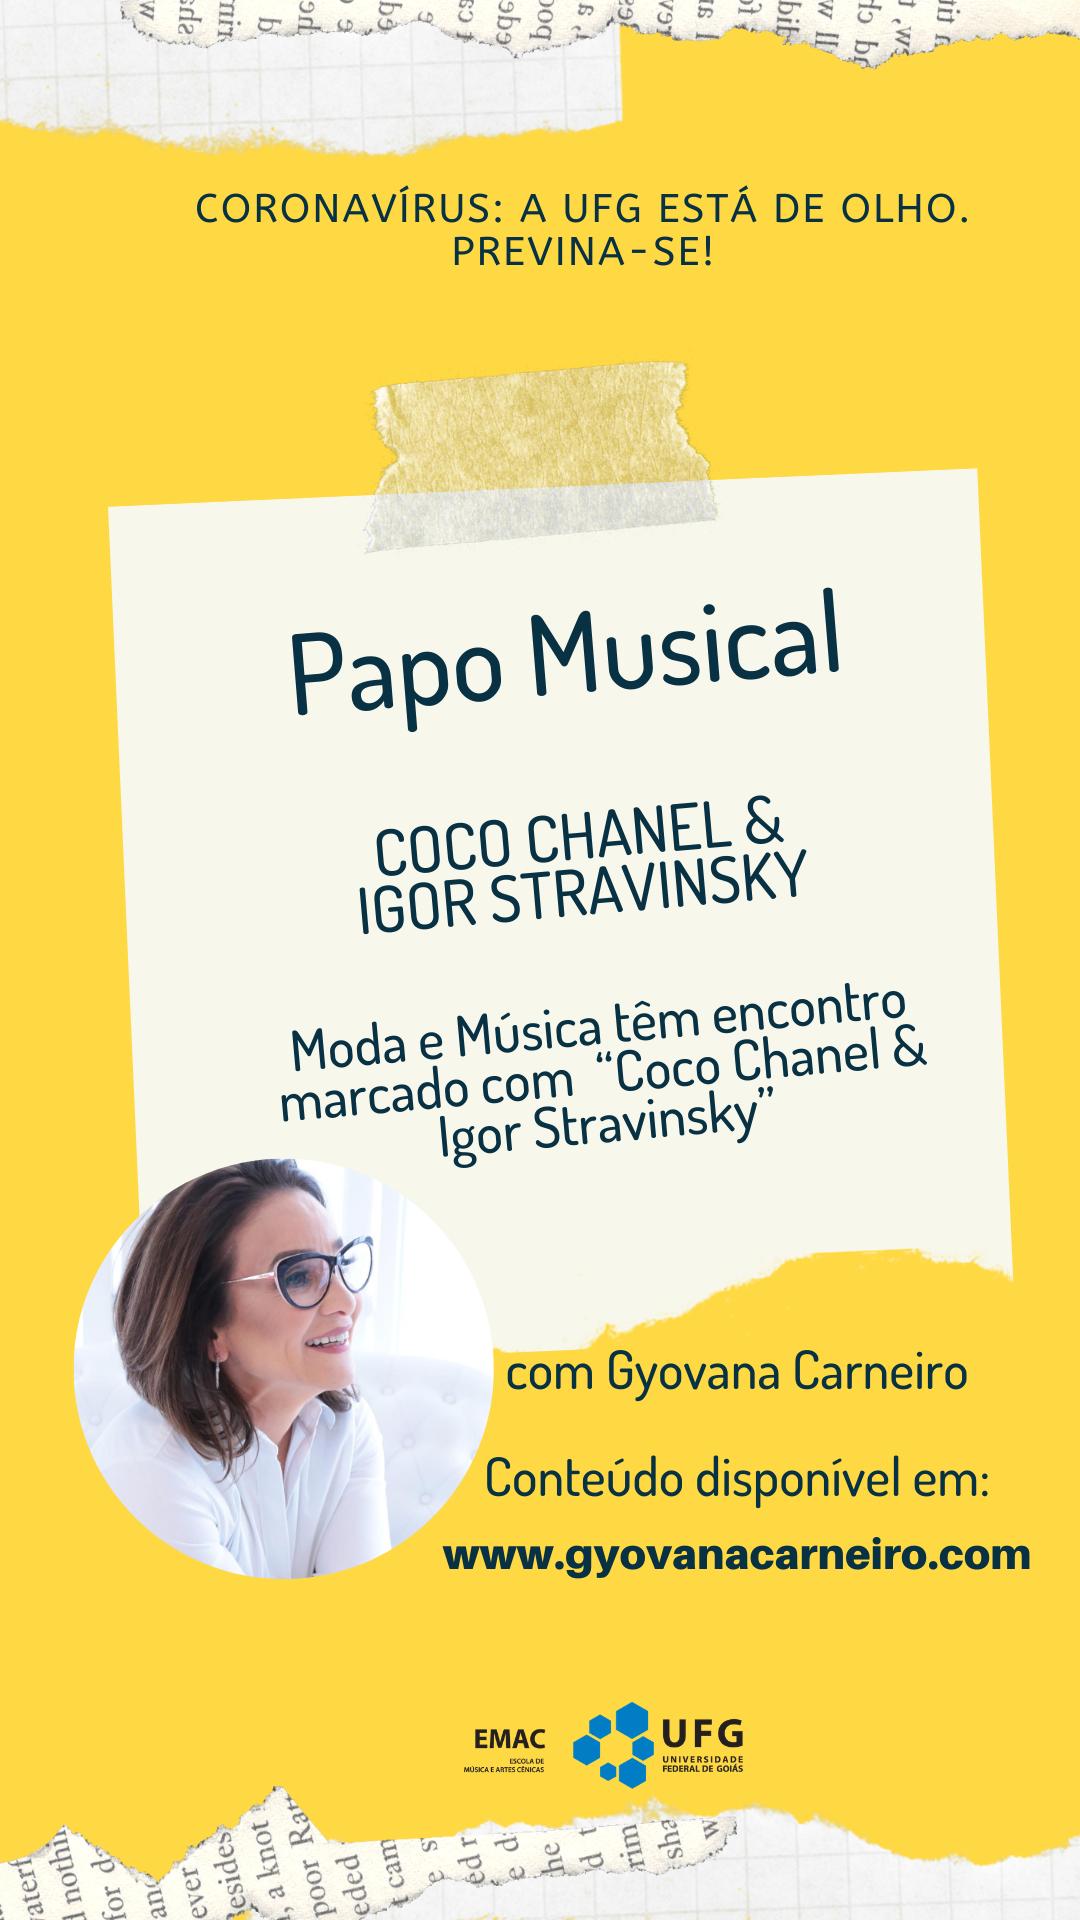 gyovana papo musical 01092020 coco chanel e igor stravinsky